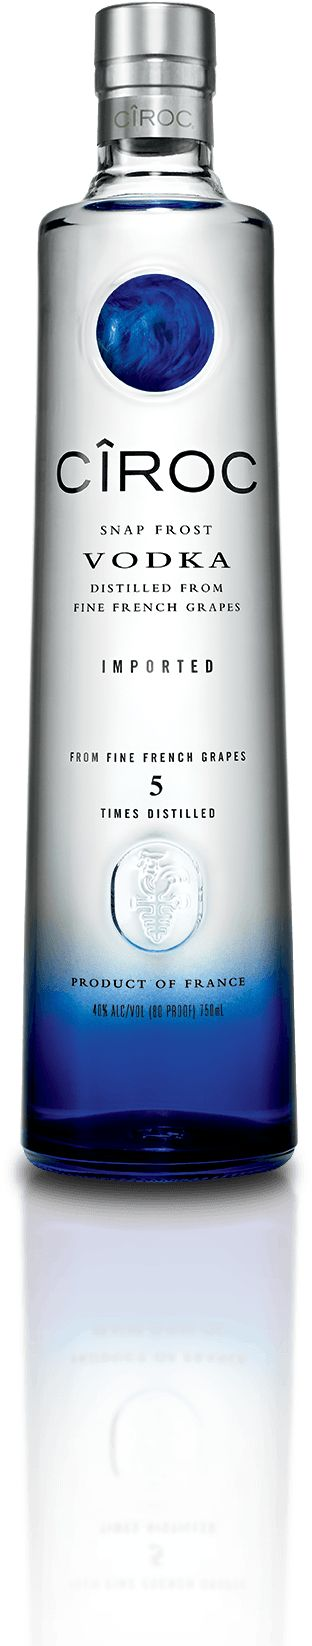 Ciroc Ultra-Premium Vodka